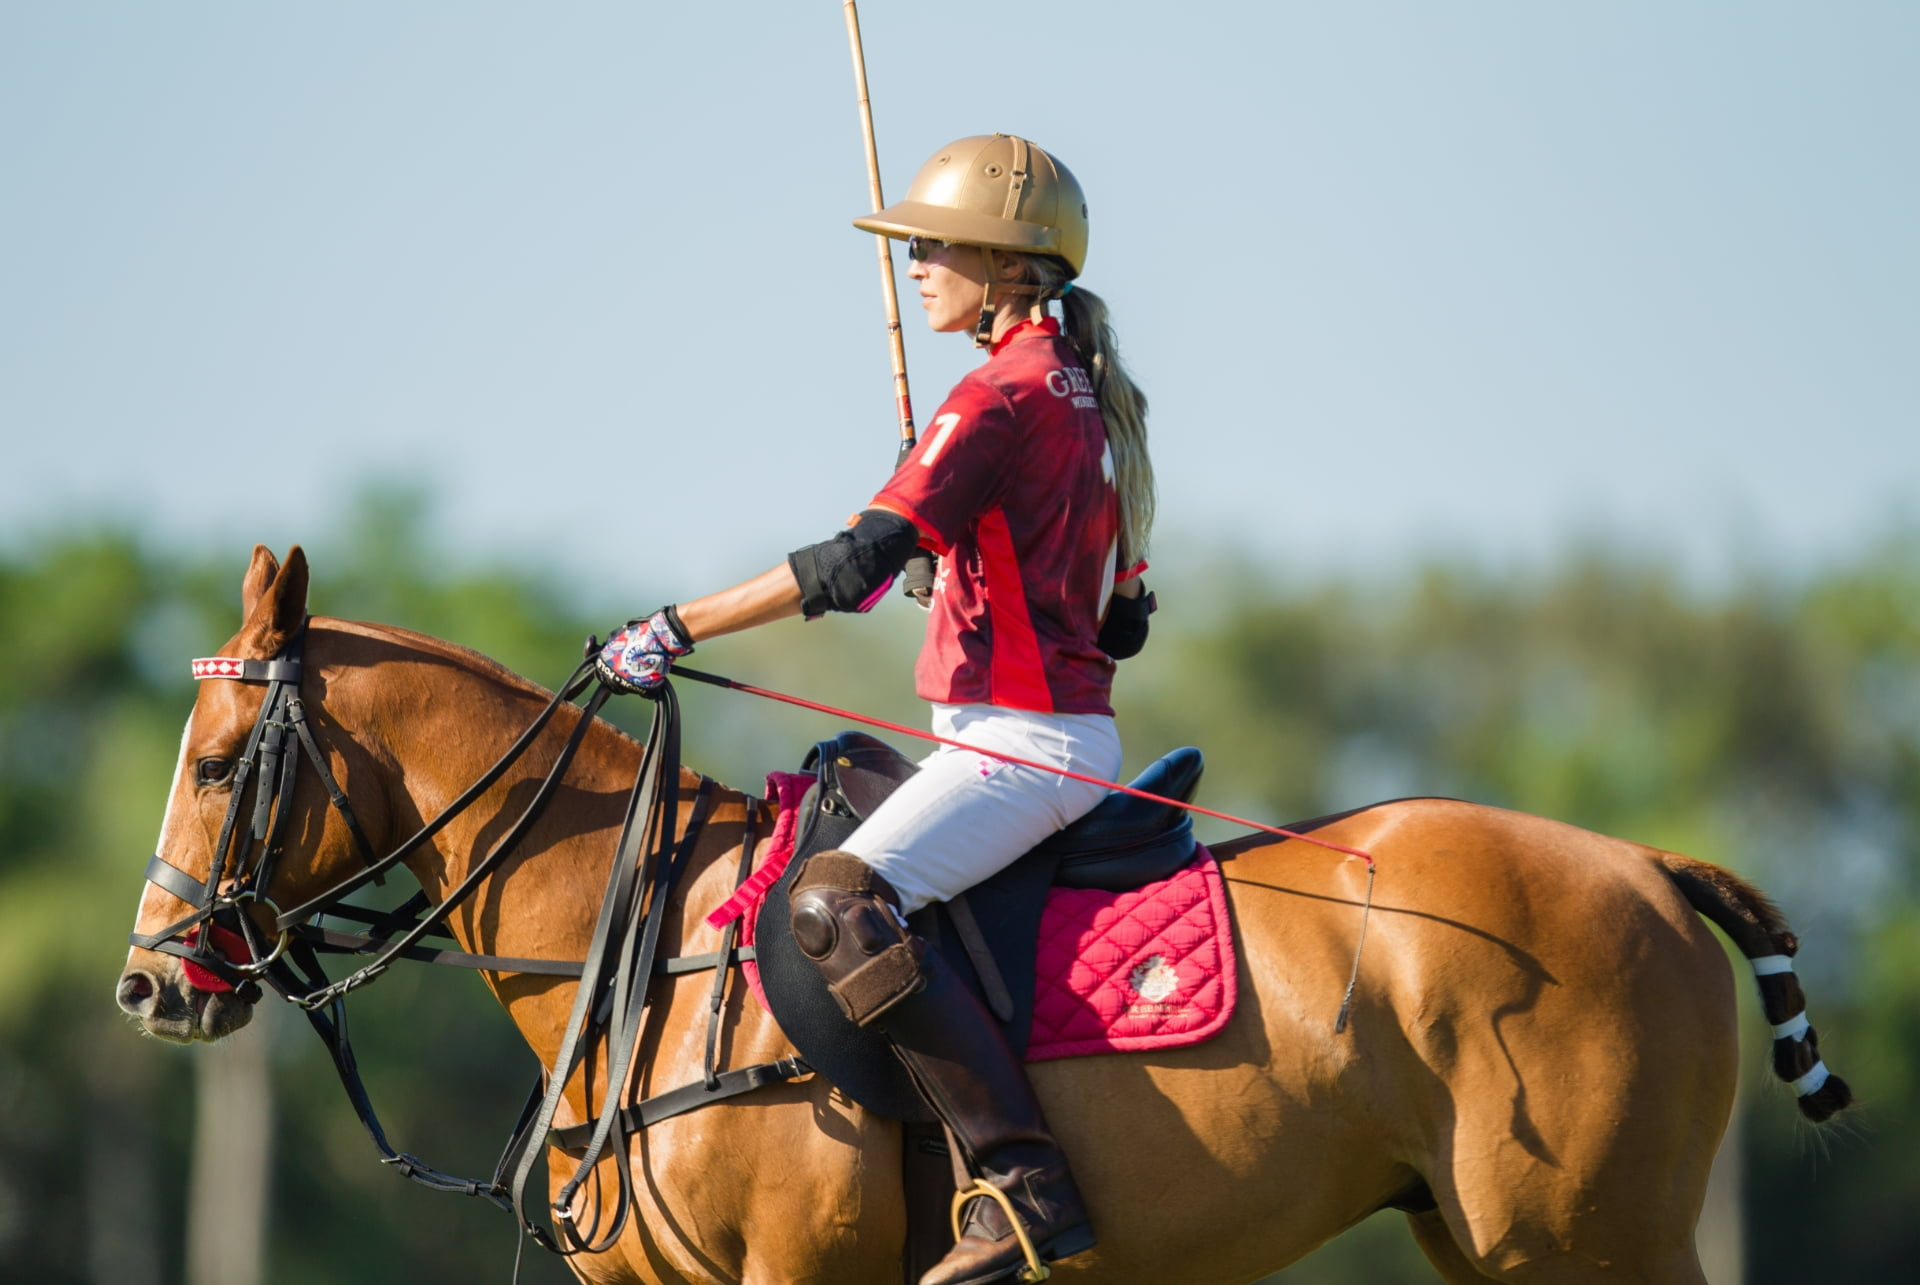 chirolacabrera Rebekah greehill la polo